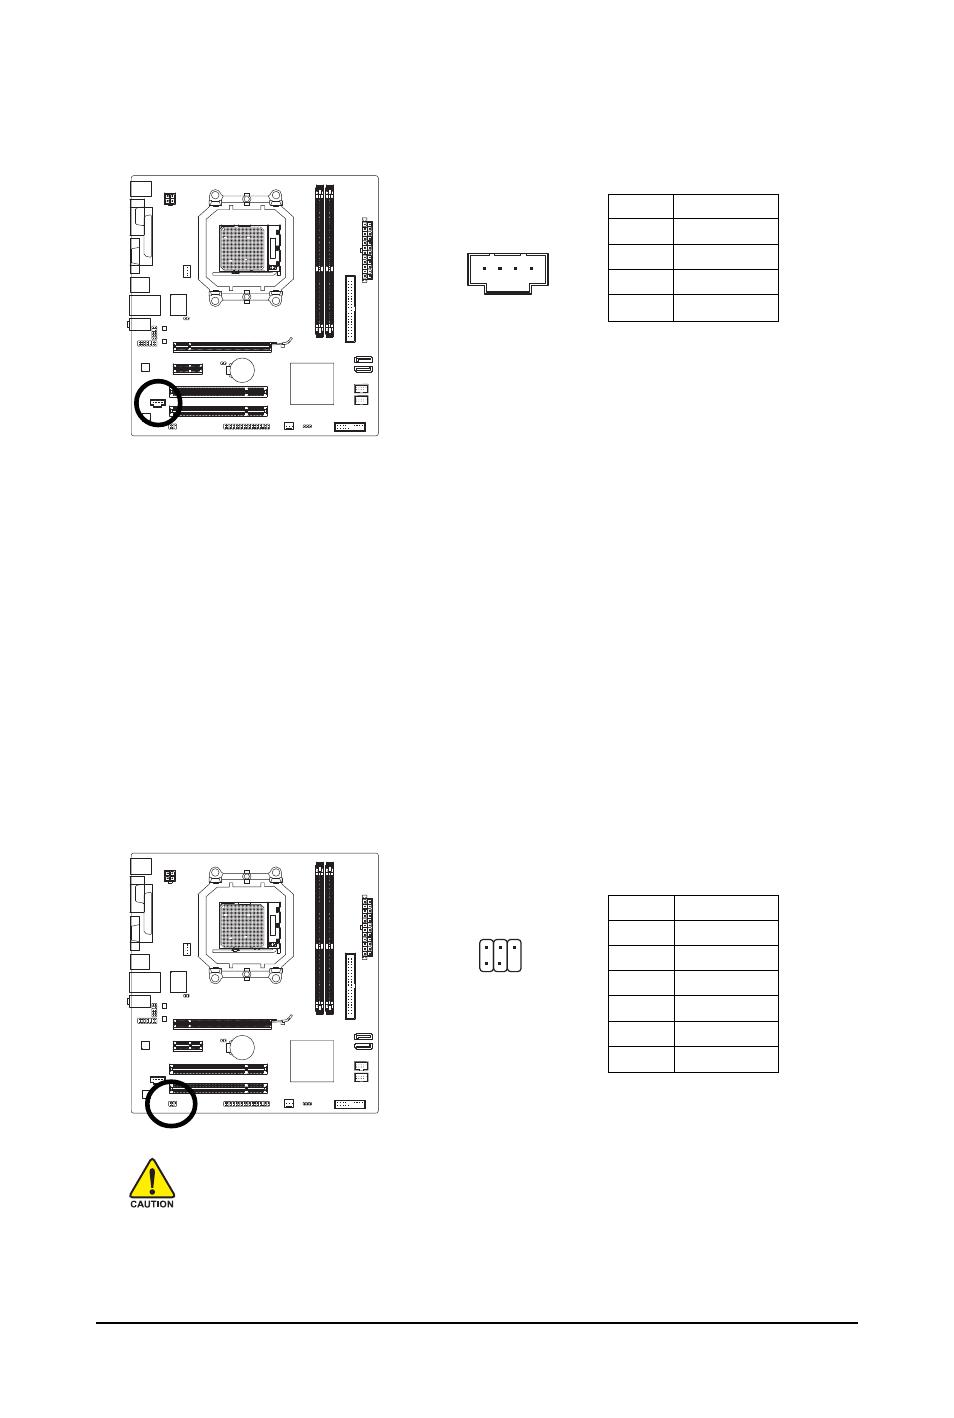 14 spdif io s pdif out header 13 cd in cd in connector rh manualsdir com Operators Manual Operators Manual